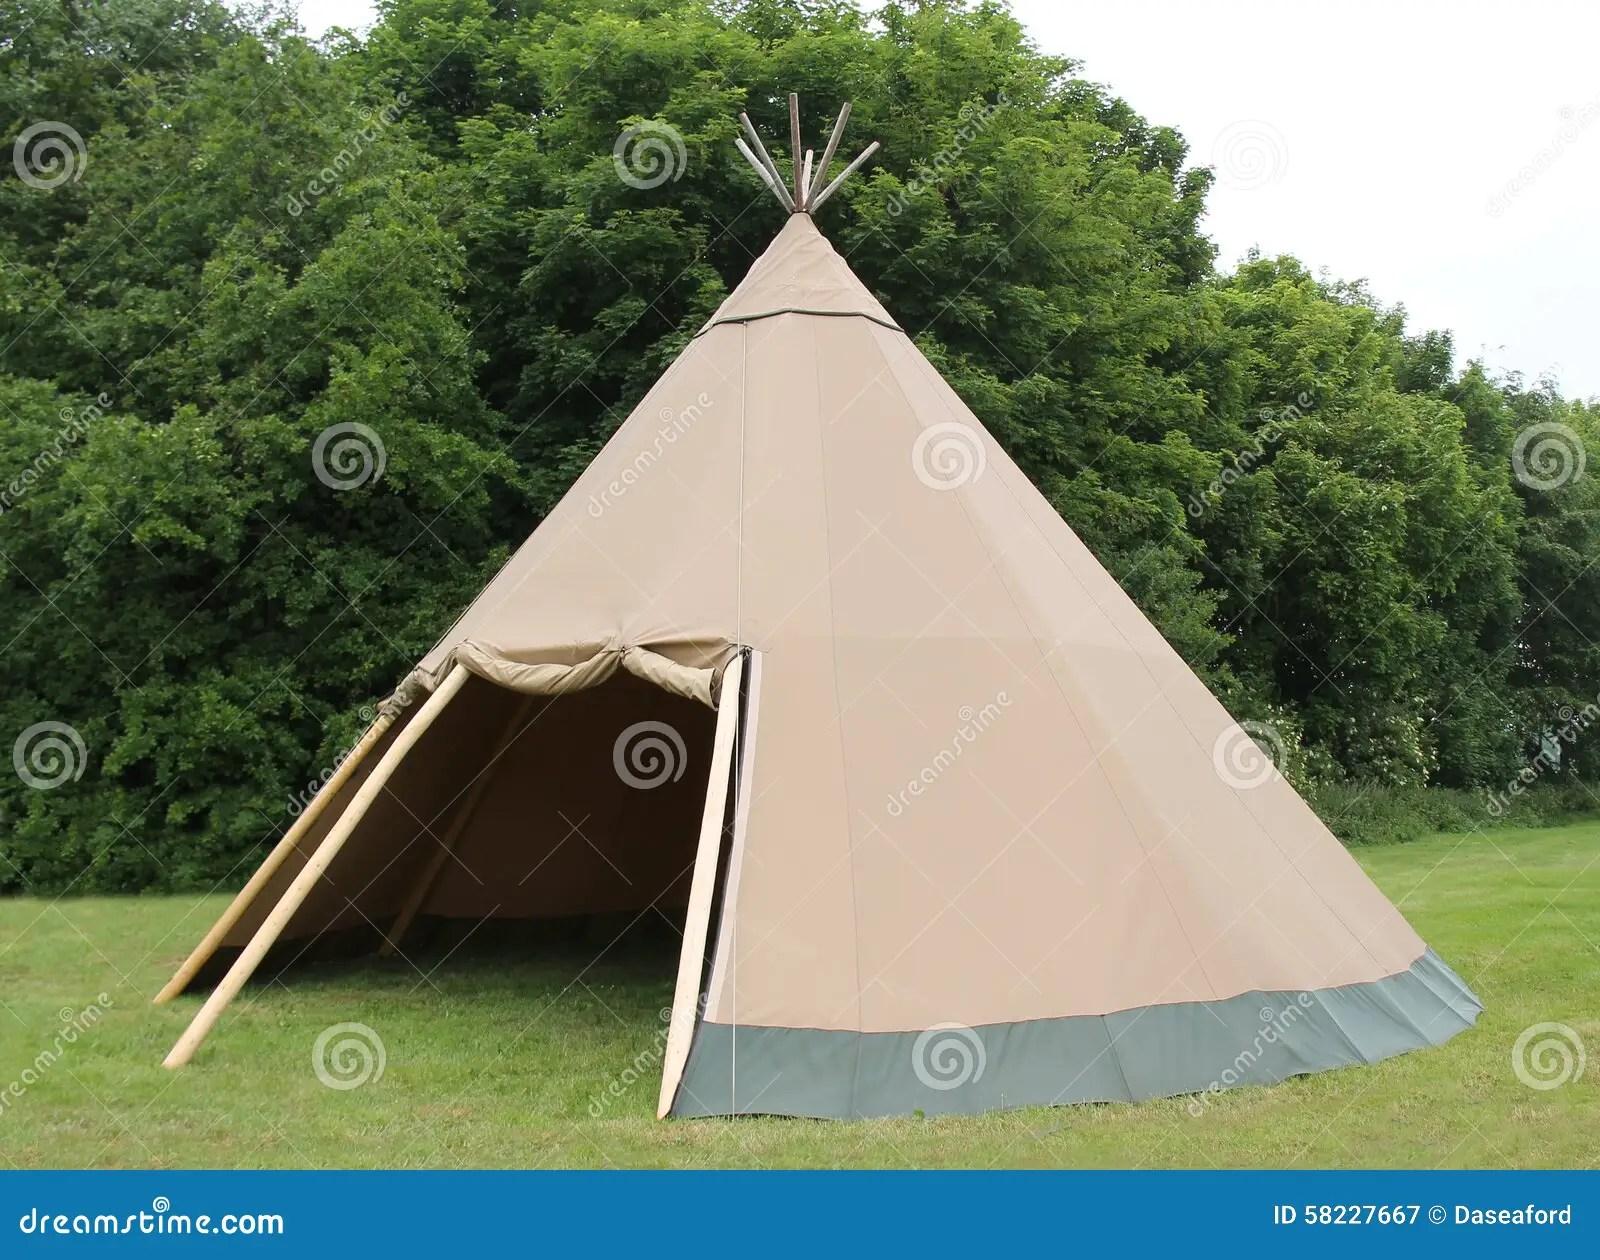 Wigwam Tent. stock image. Image of poles, pegs, vintage